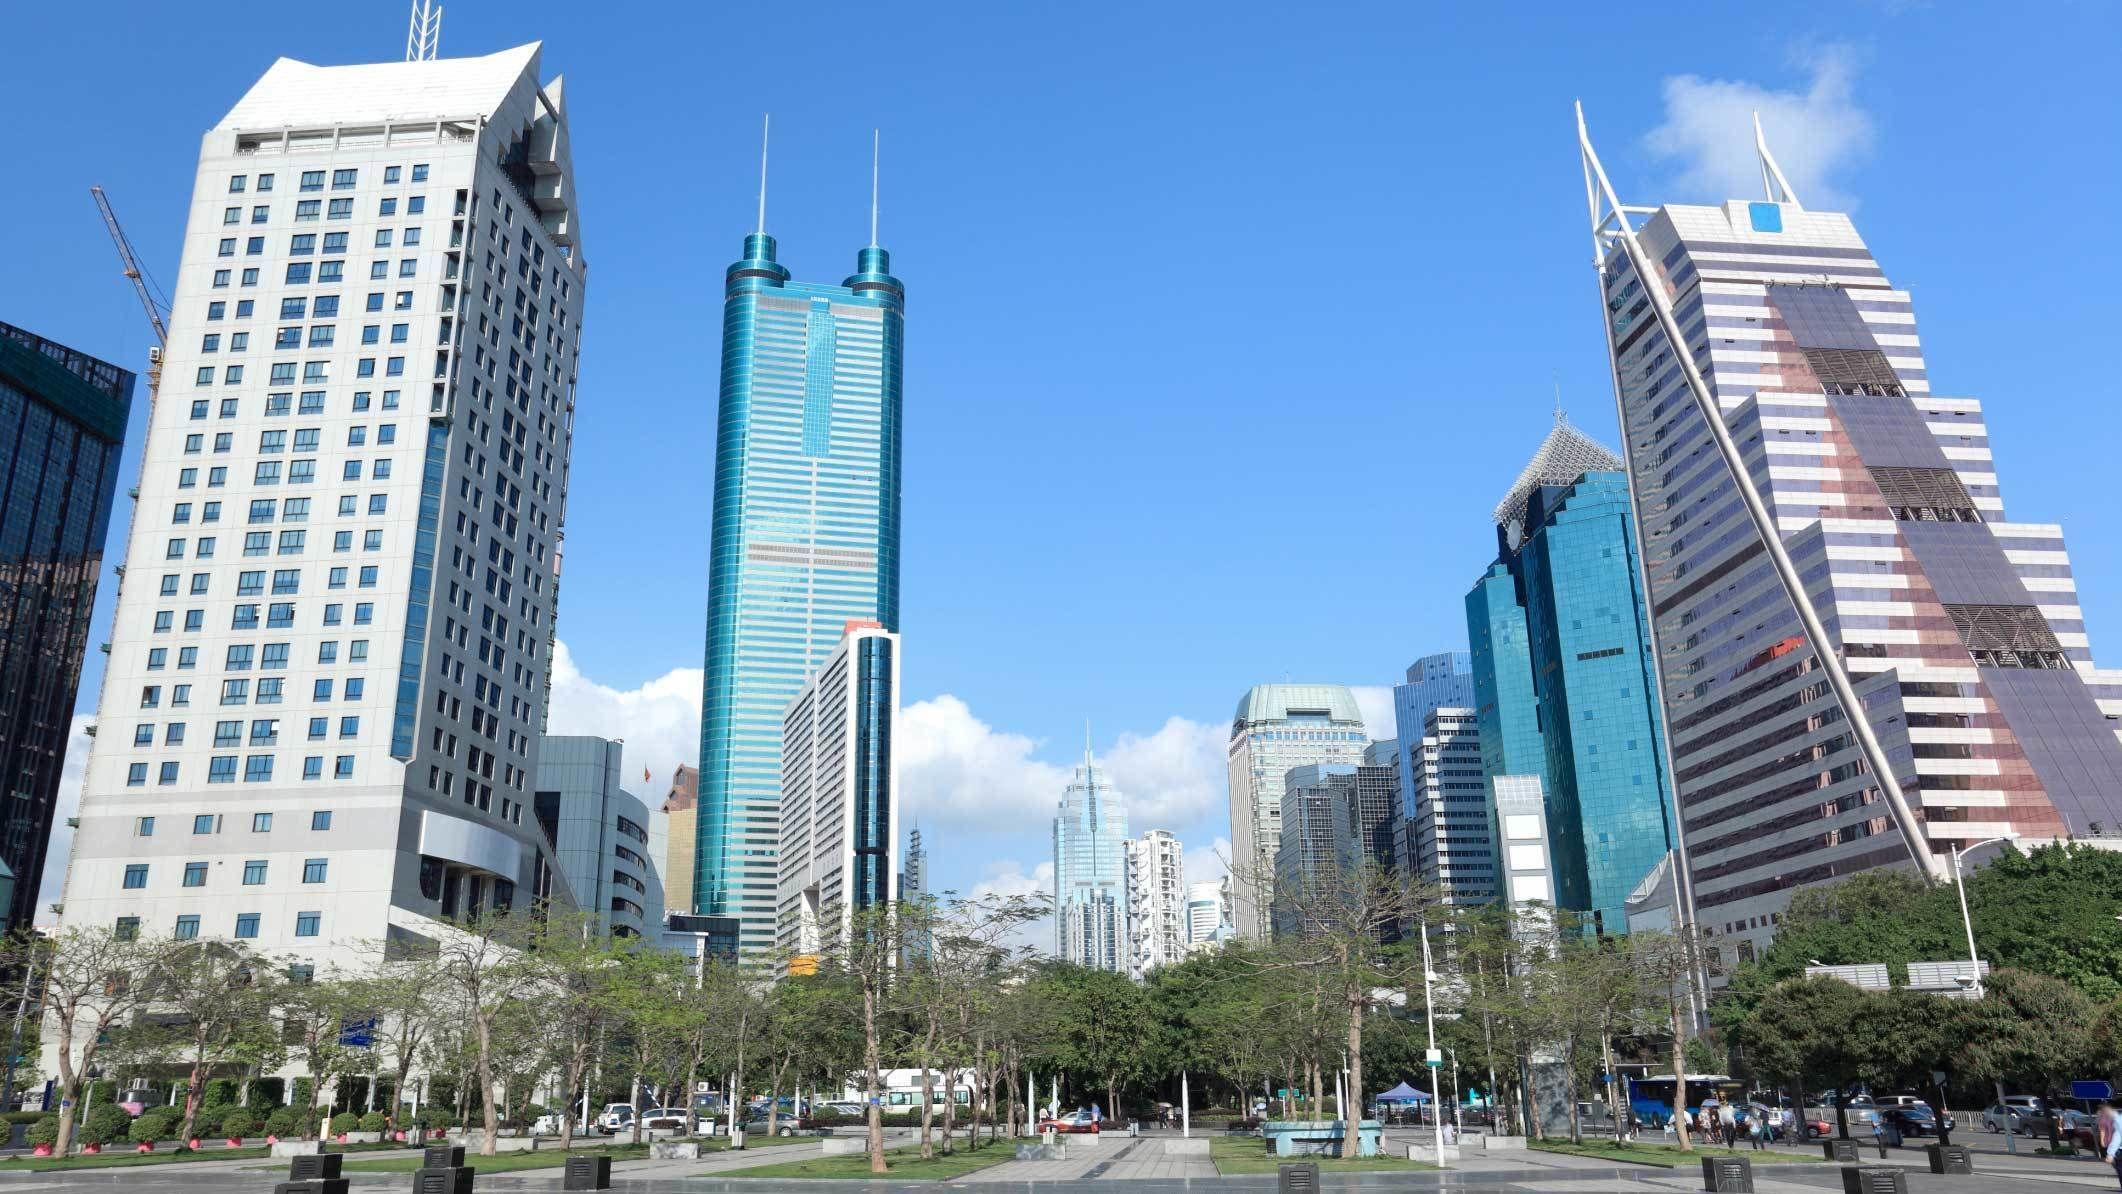 Landscape view of Shenzhen City